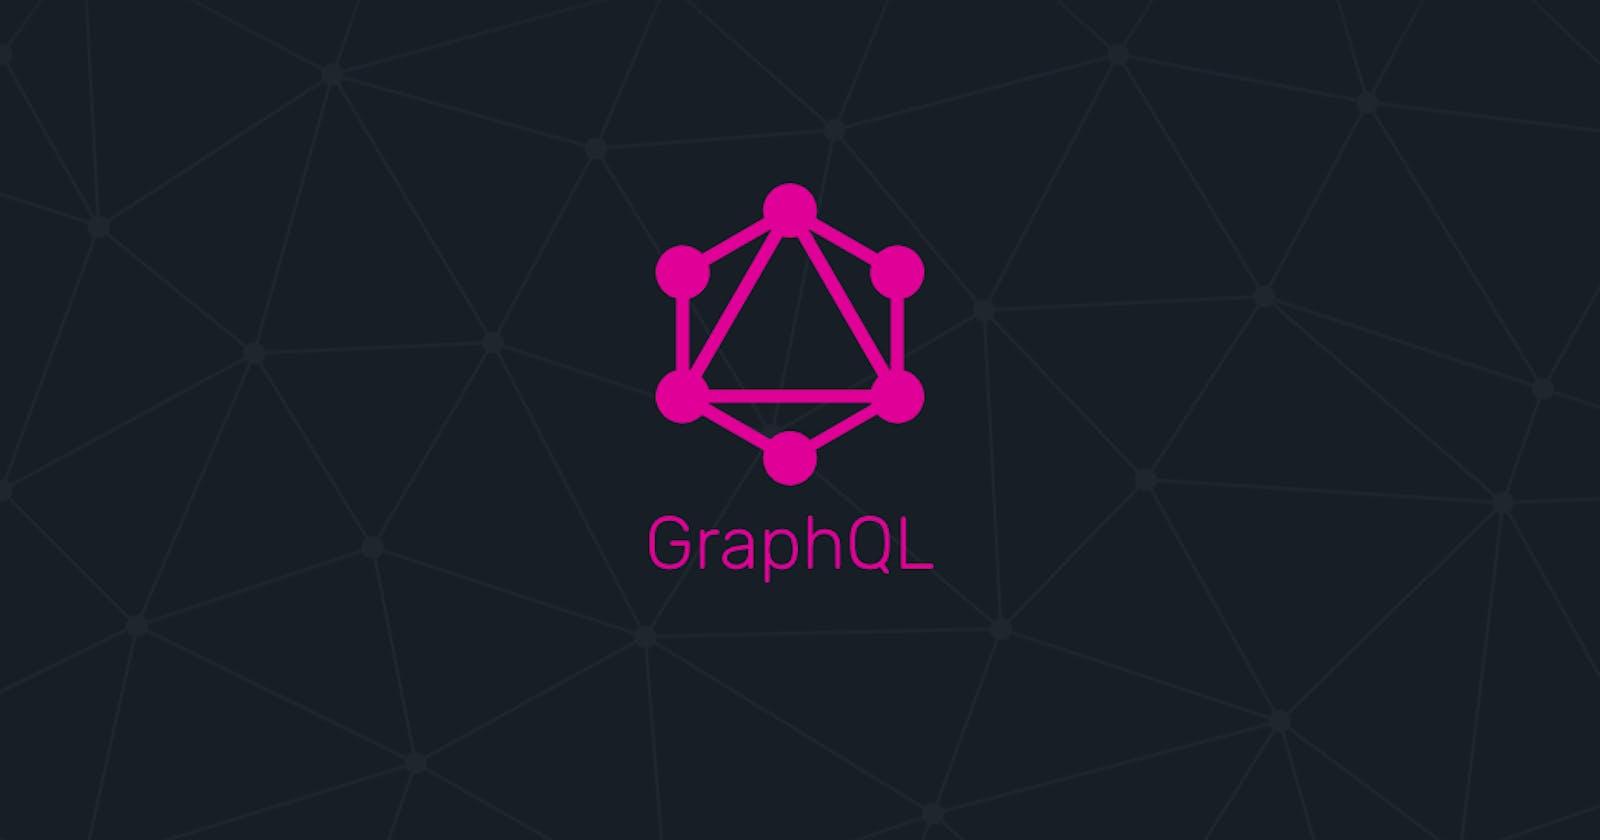 GraphQL - The good and the bad parts